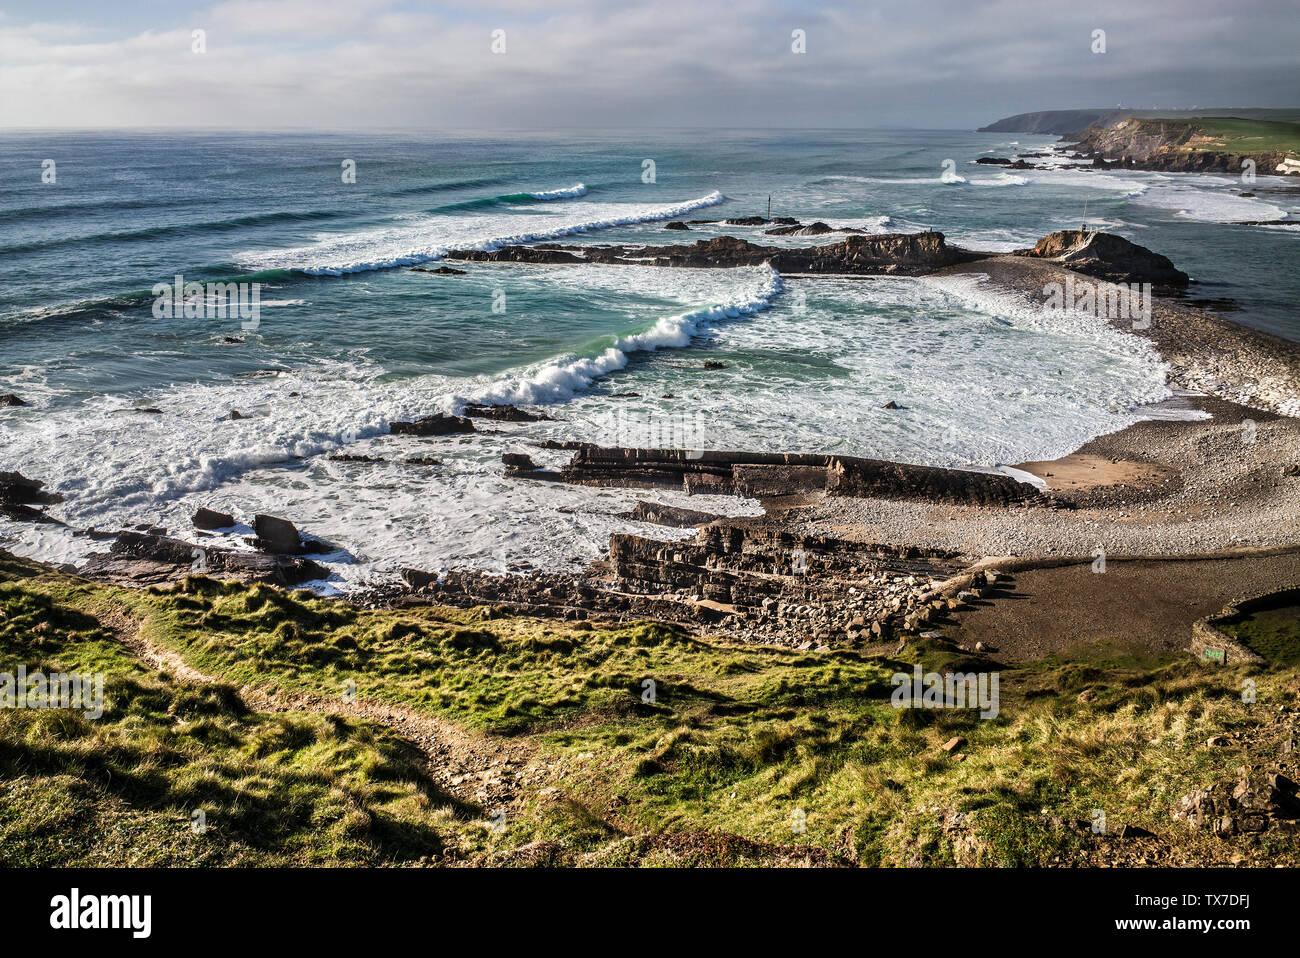 coastline on coastal path south of bude Cornwall, Stock Photo